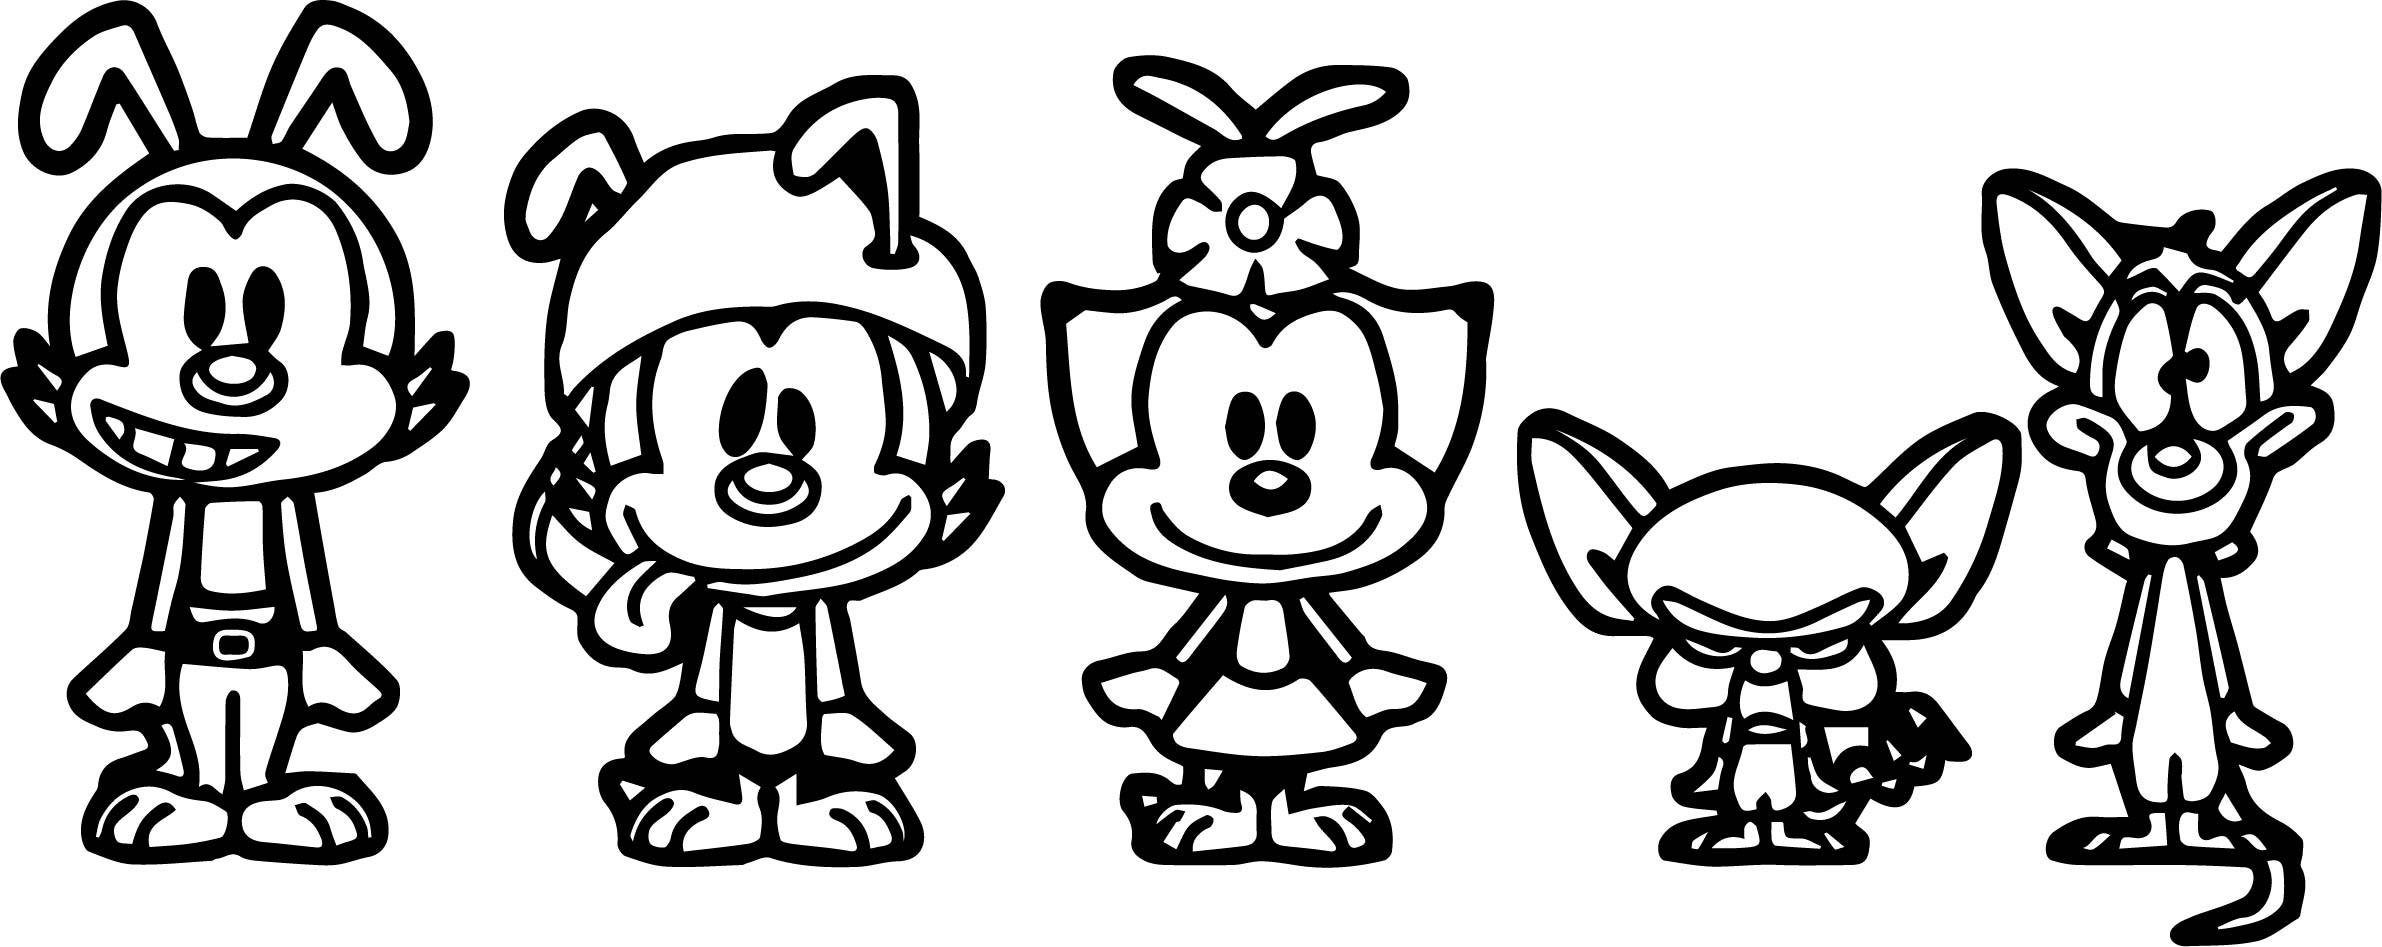 Animaniacs Pacs Chibi Coloring Page